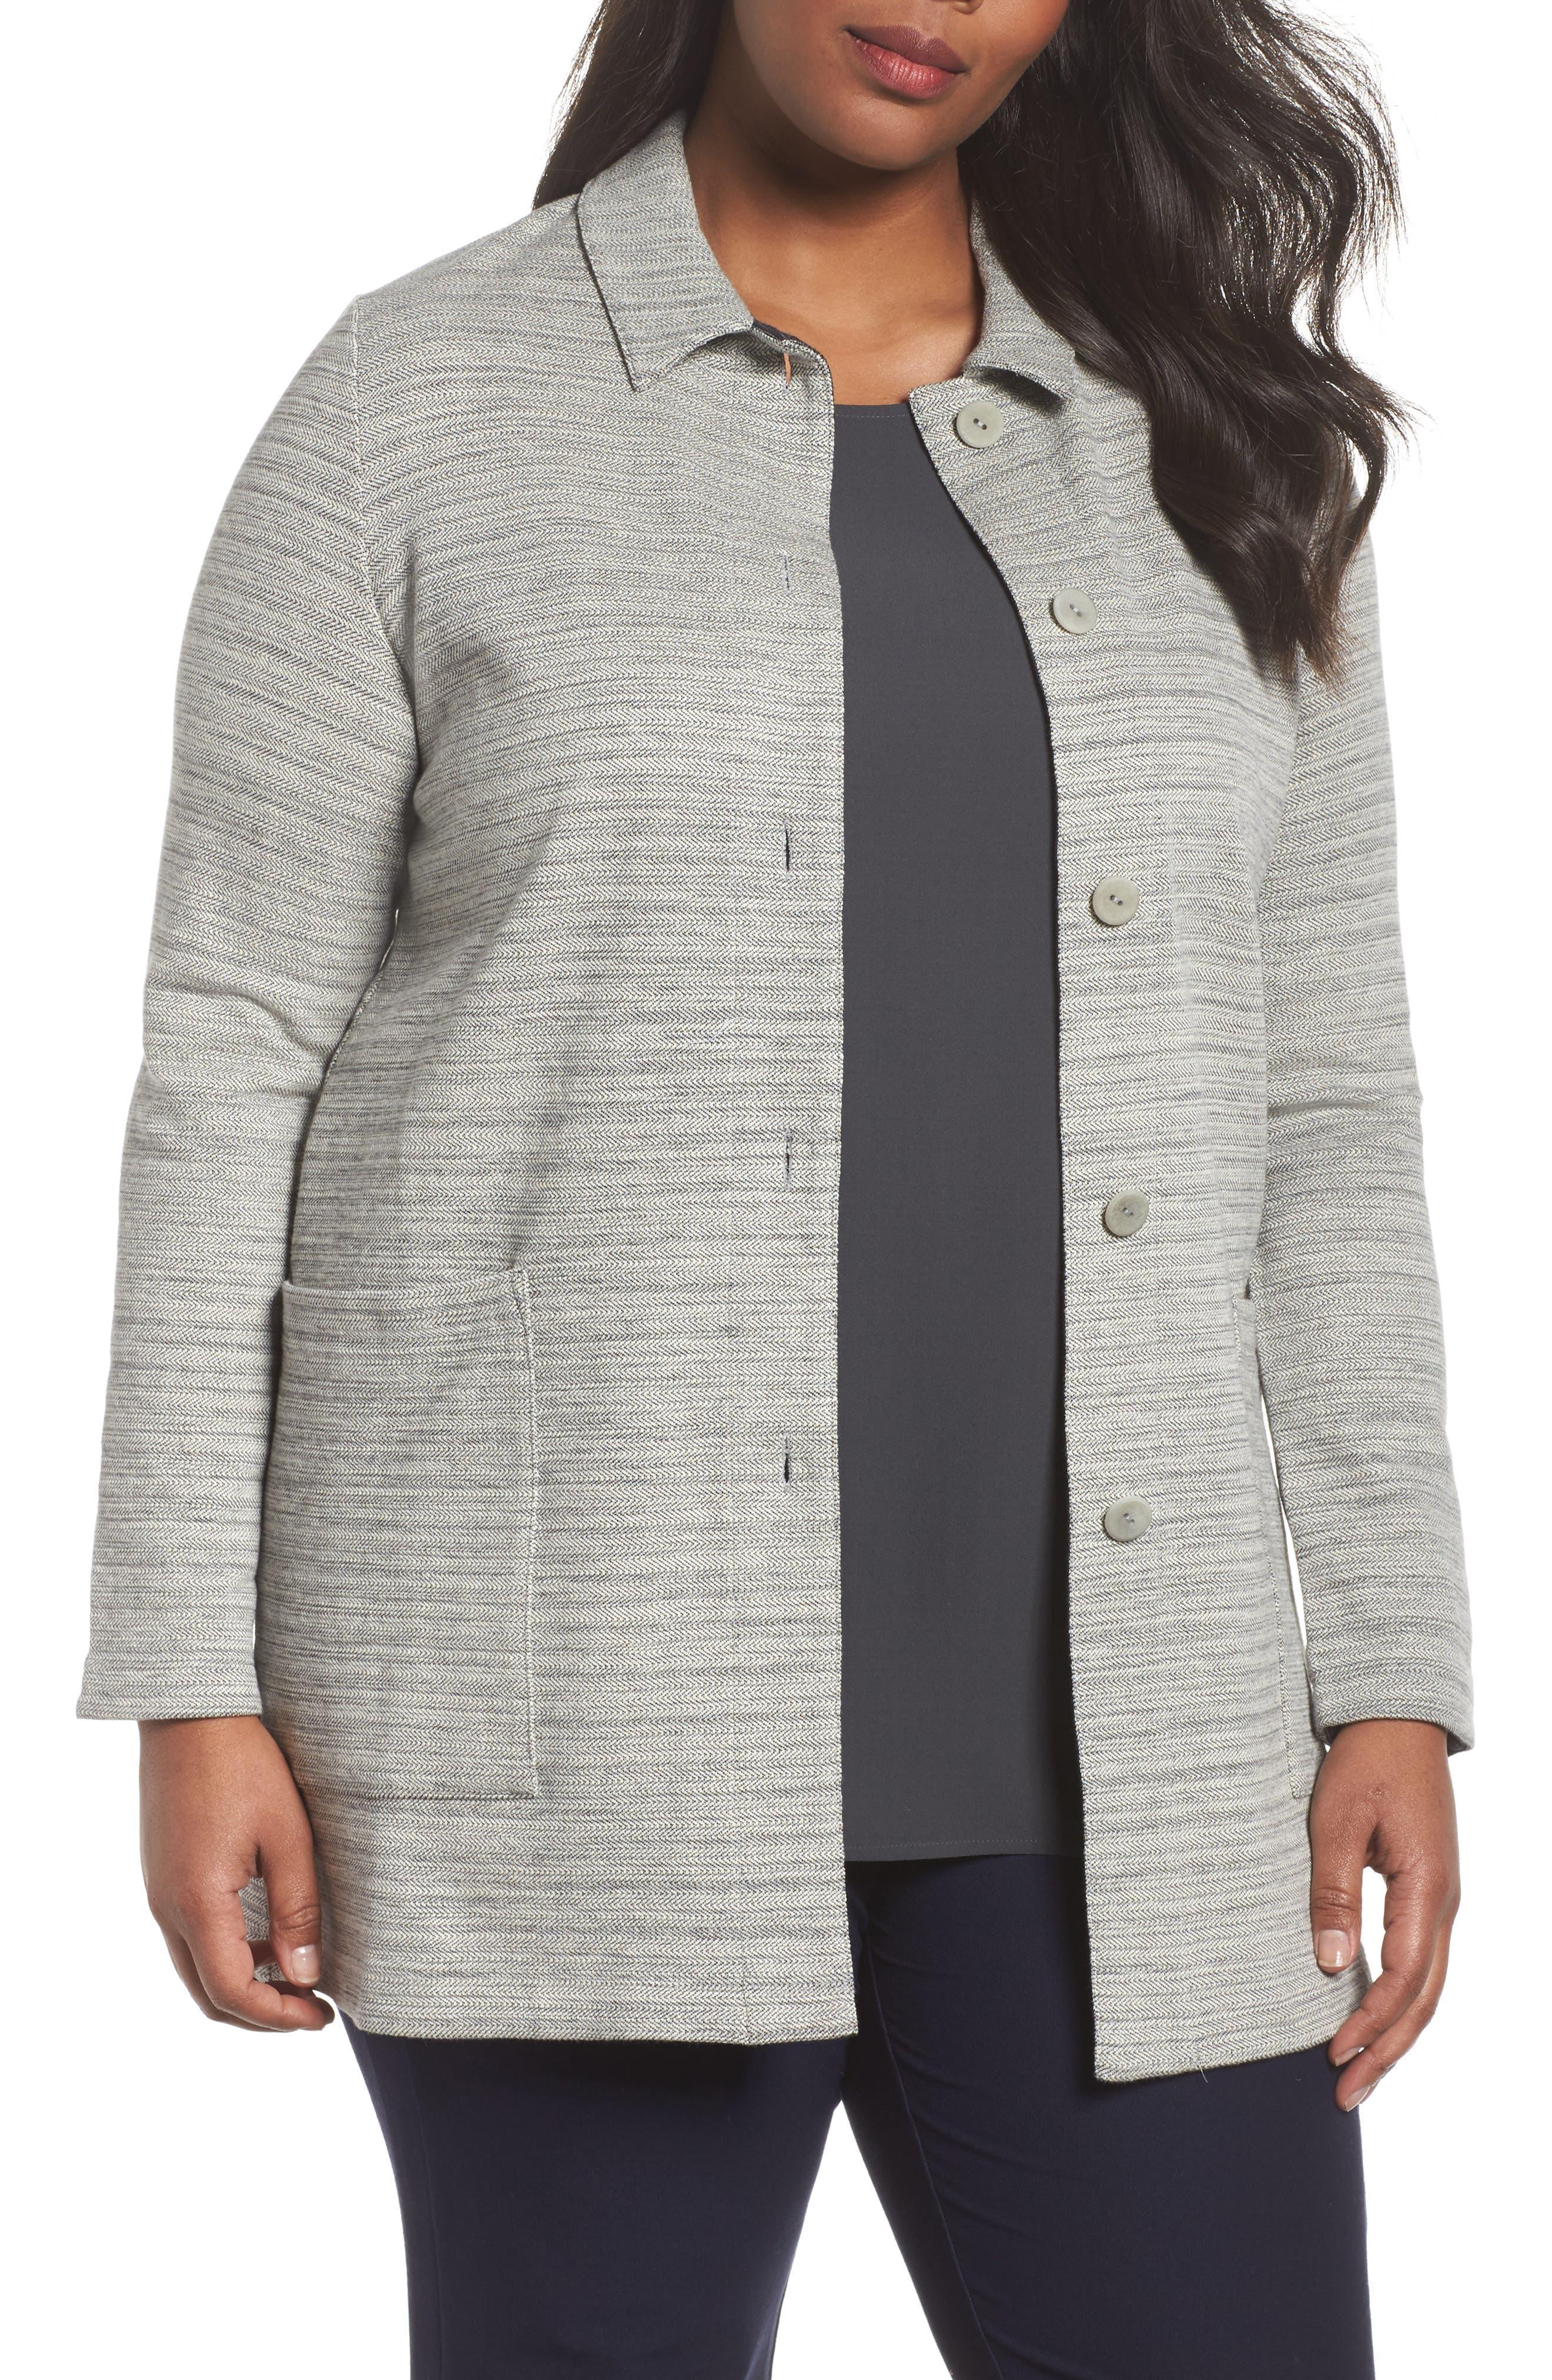 Cotton Blend Tweed Jacket,                             Main thumbnail 1, color,                             Dark Pearl